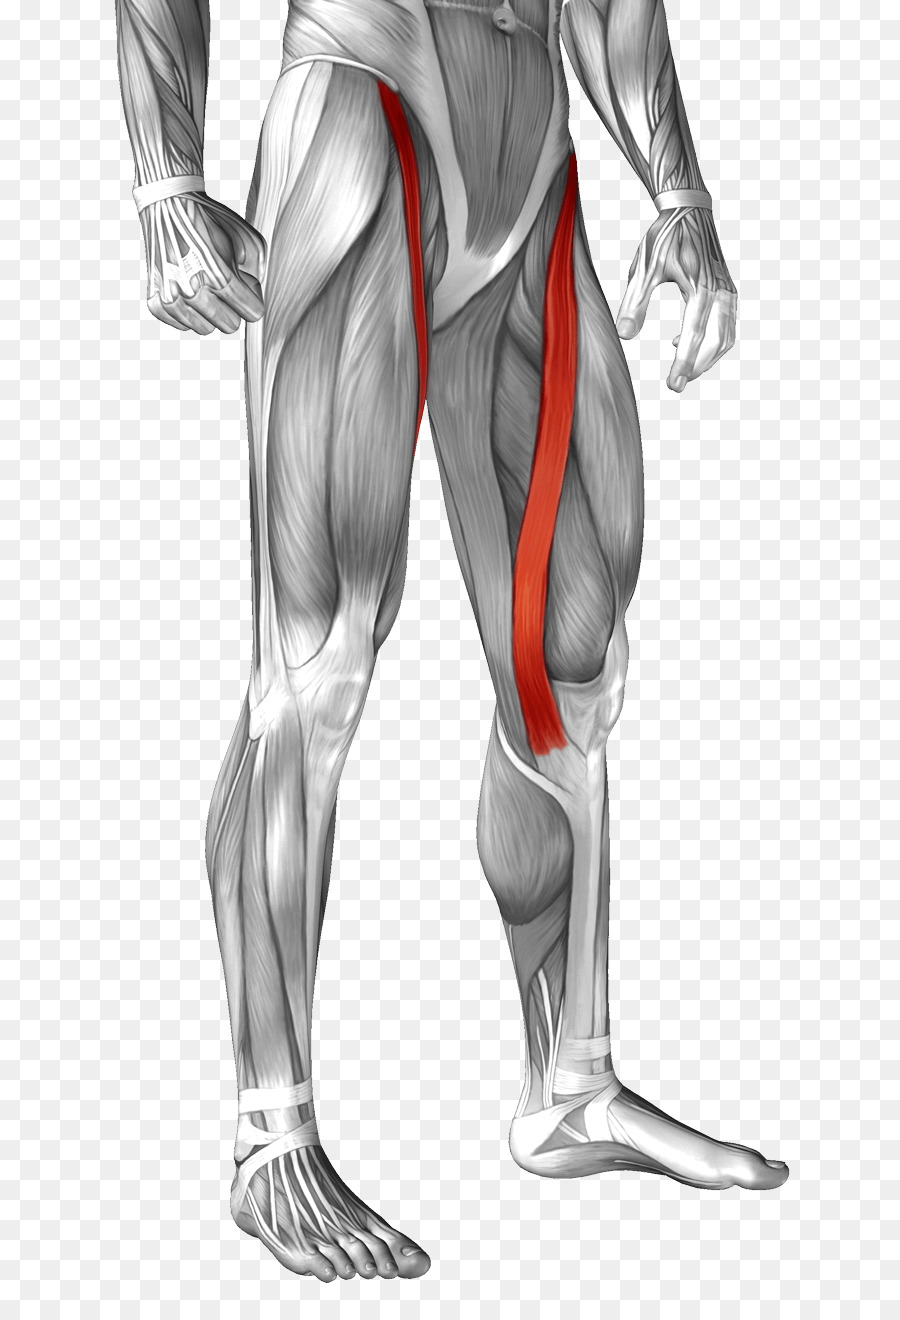 Sartorius Muscle Anatomy Rectus Femoris Muscle Human Body Muscle